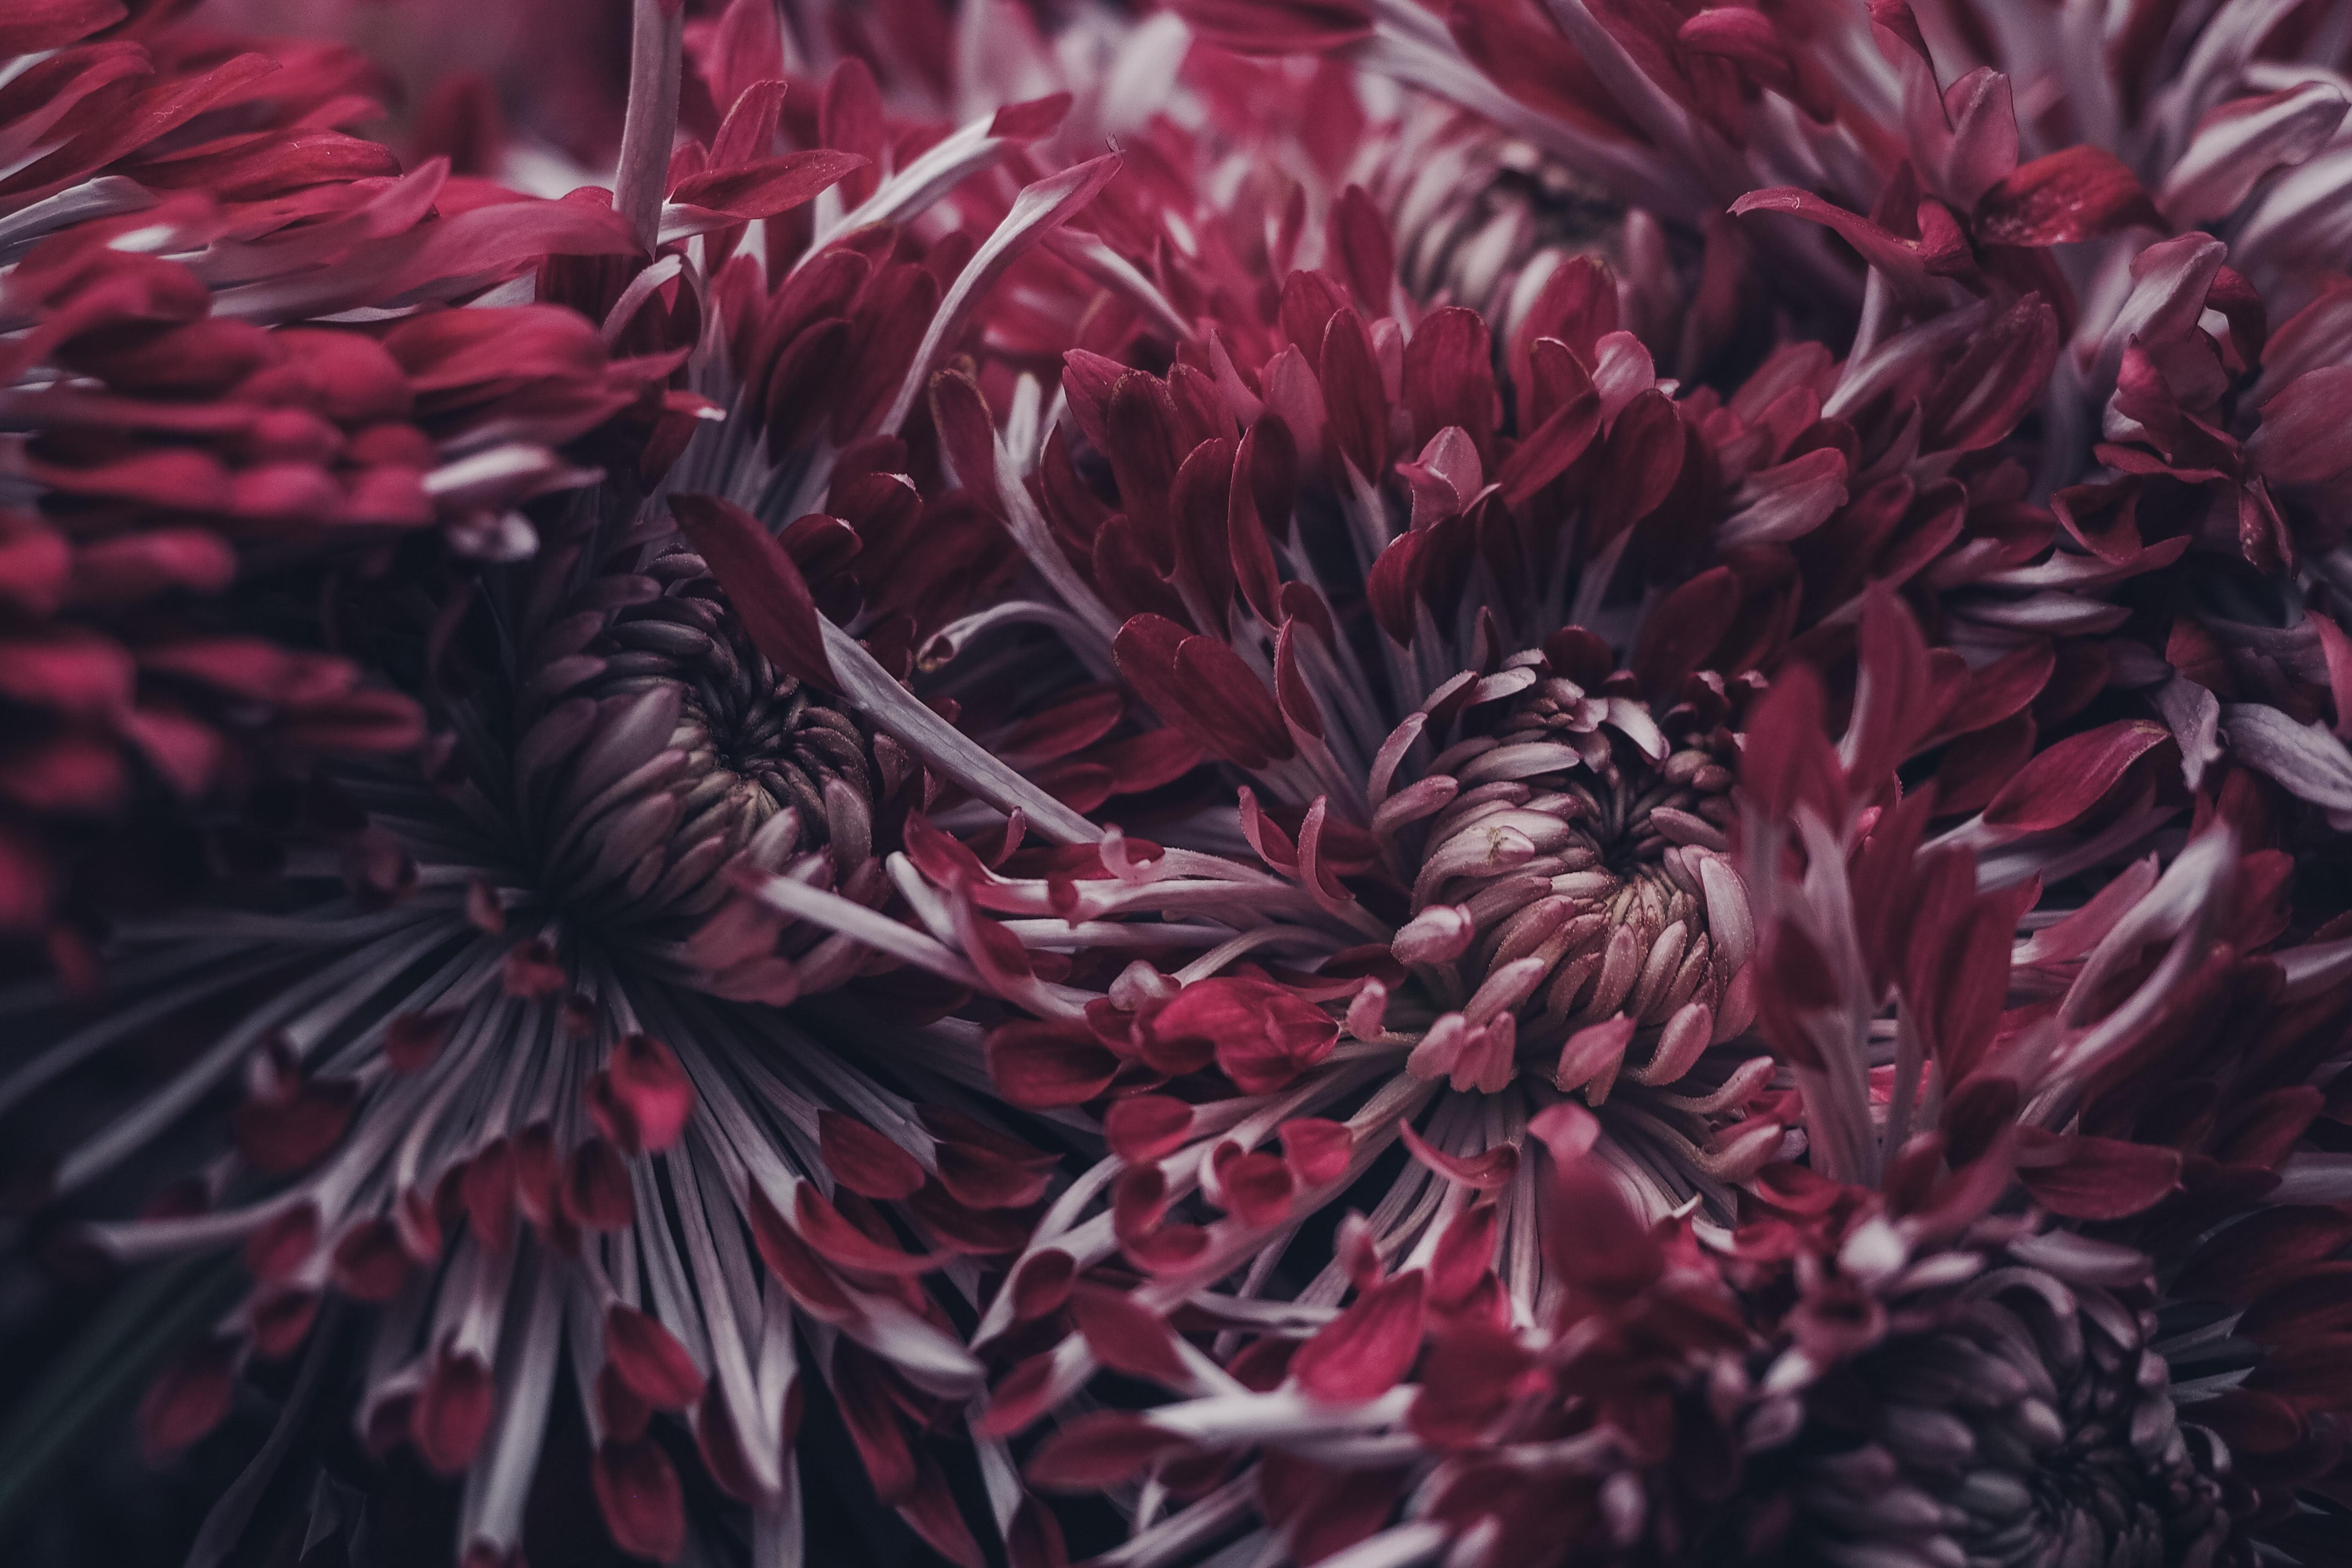 Vastu Shastra for Chrysanthemum